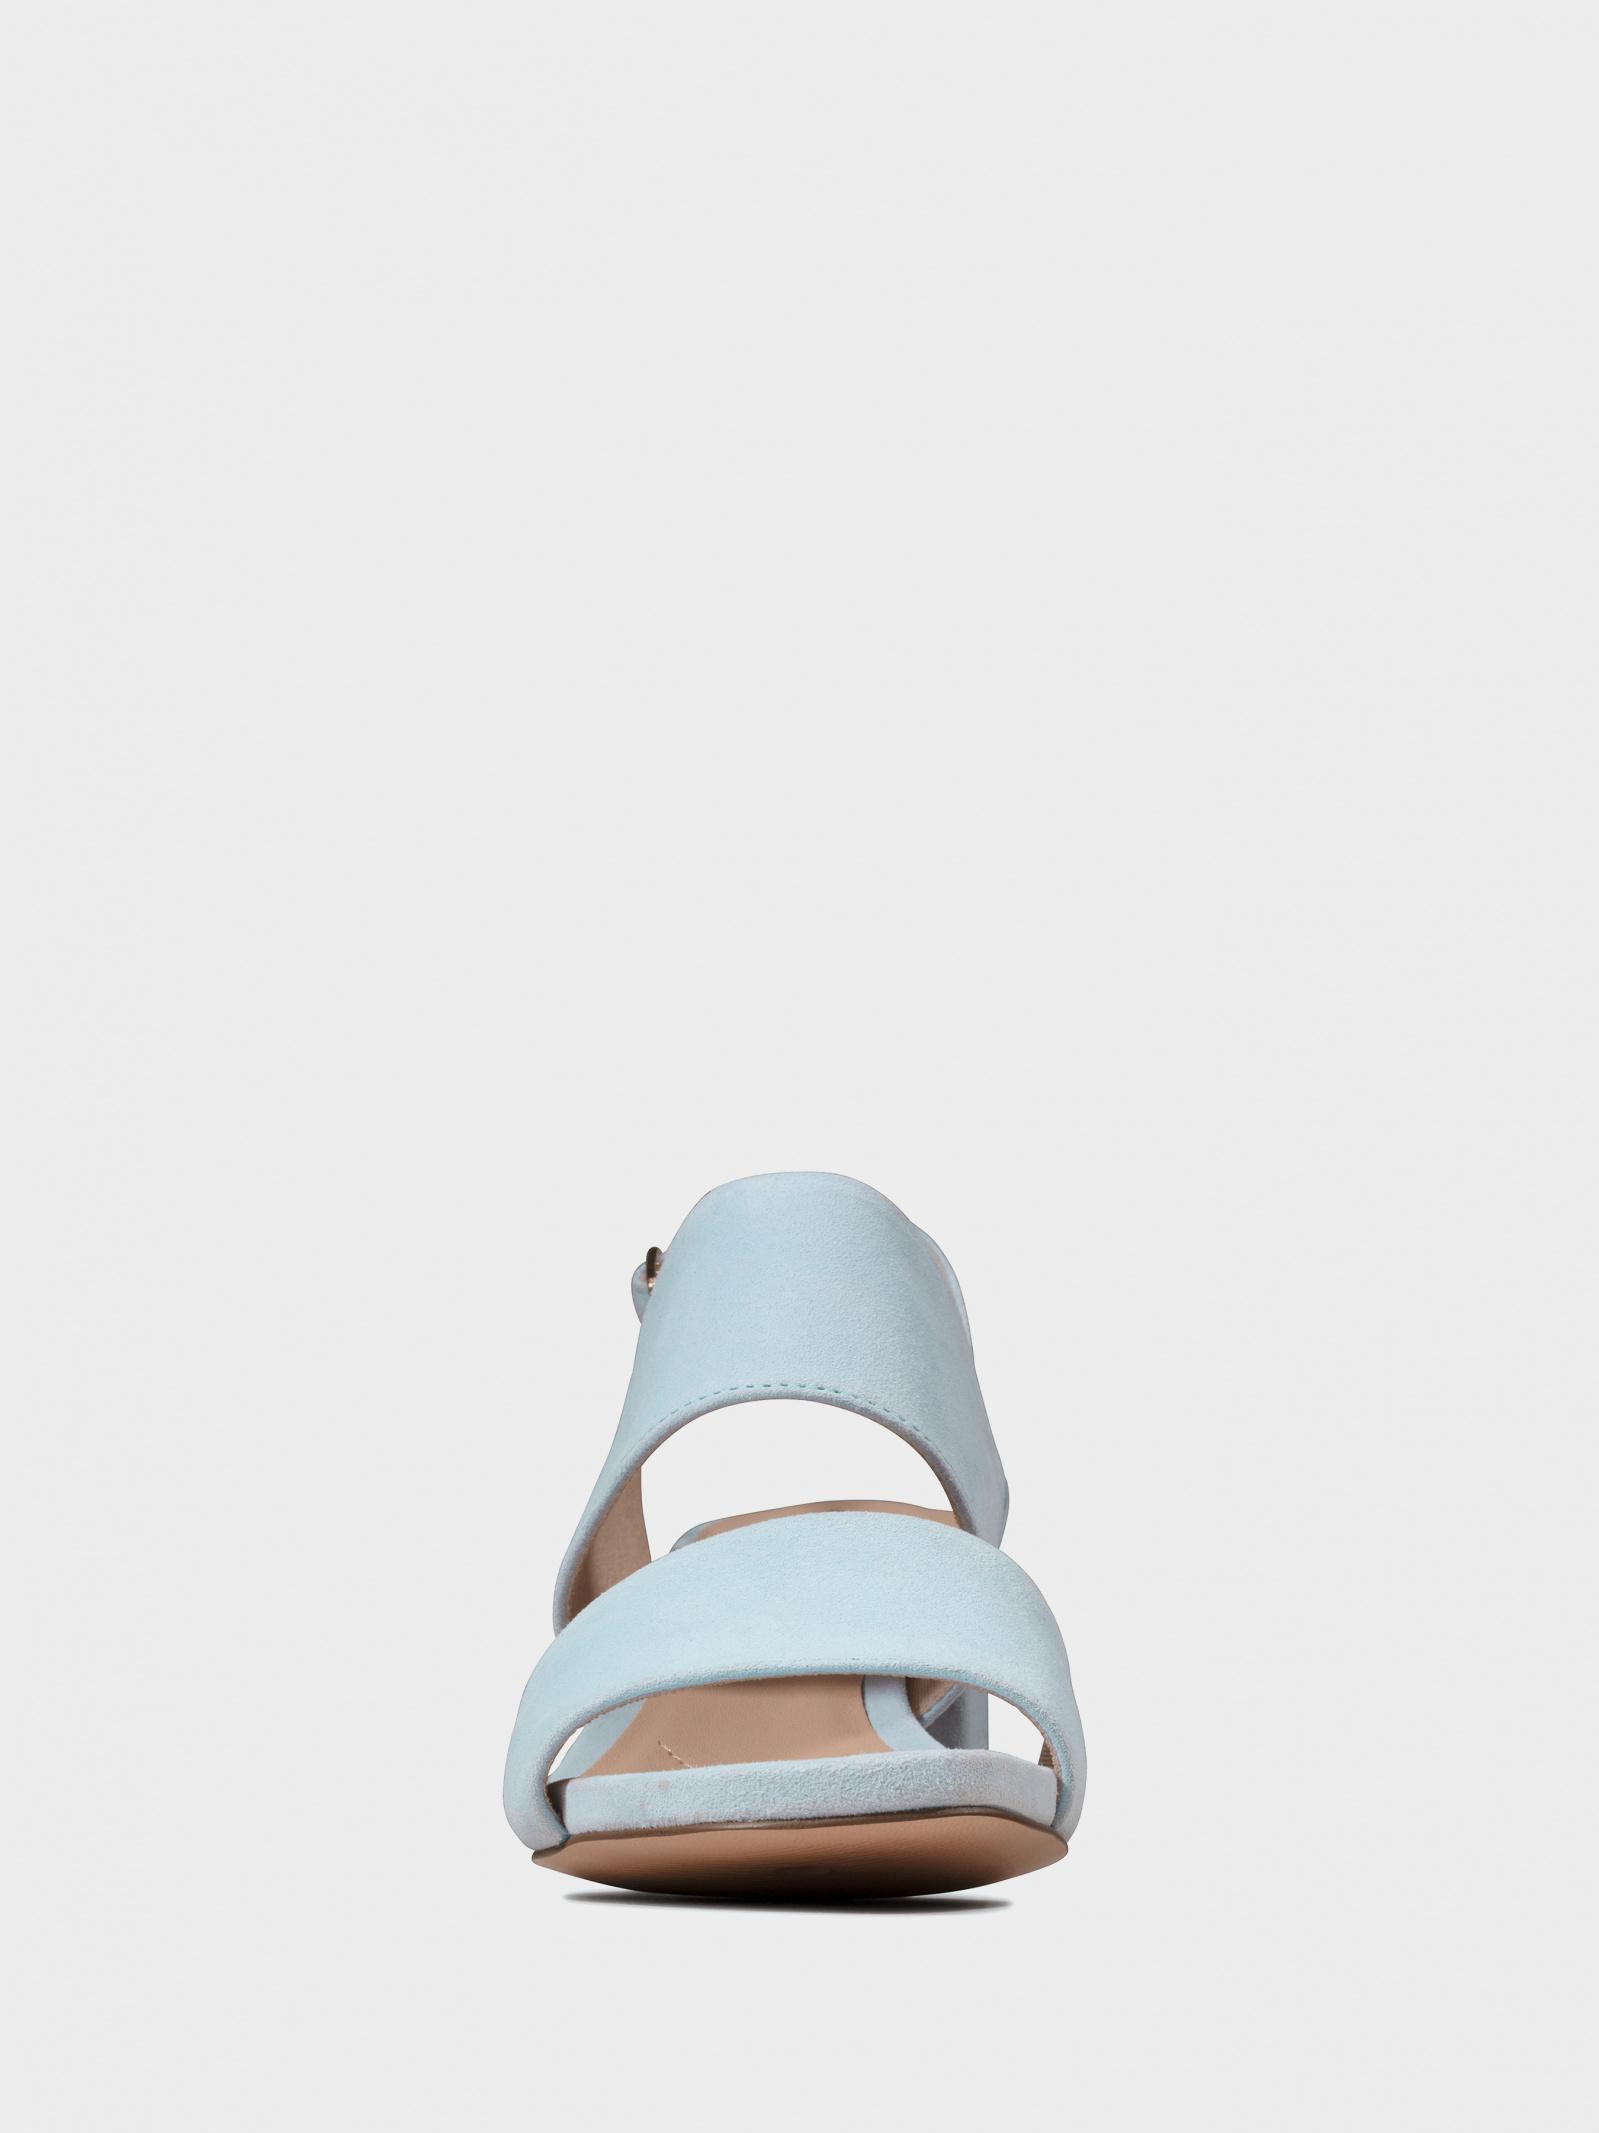 Босоніжки  для жінок Clarks Sheer55 Sling 2614-8881 брендове взуття, 2017